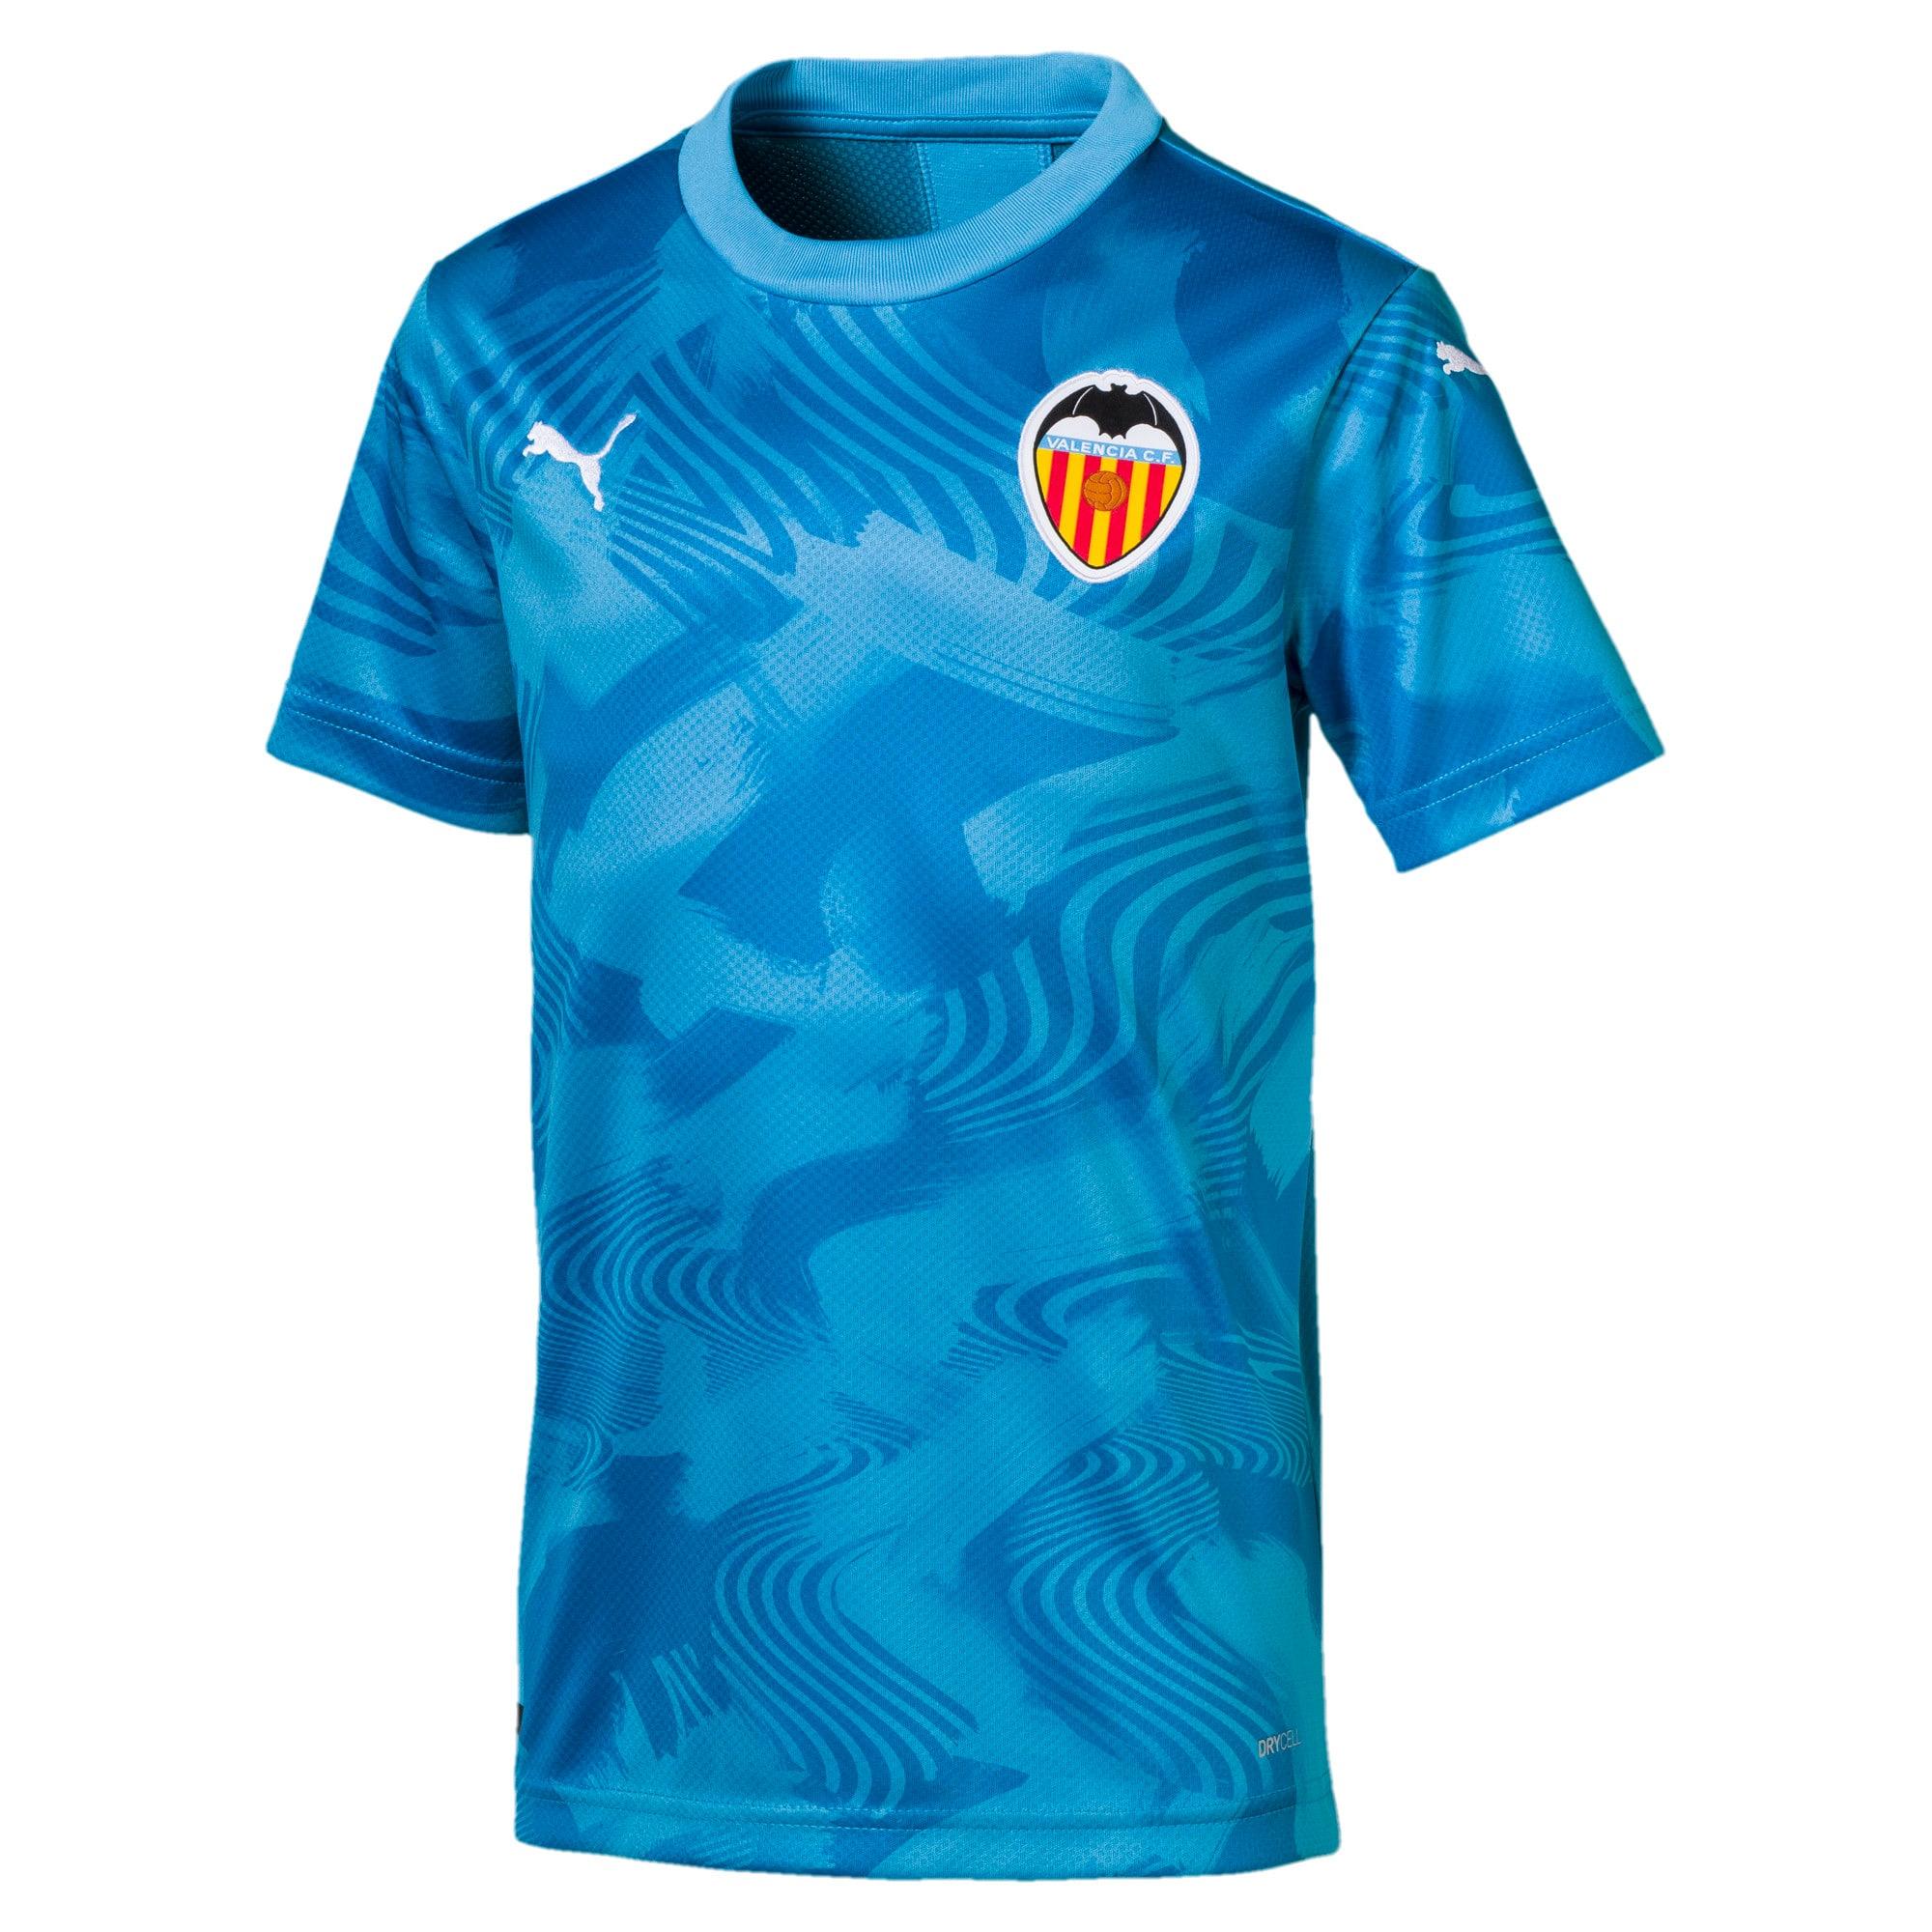 Thumbnail 1 of Valencia CF Third Replica Kids' Shirt, Bleu Azur-Indigo Bunting, medium